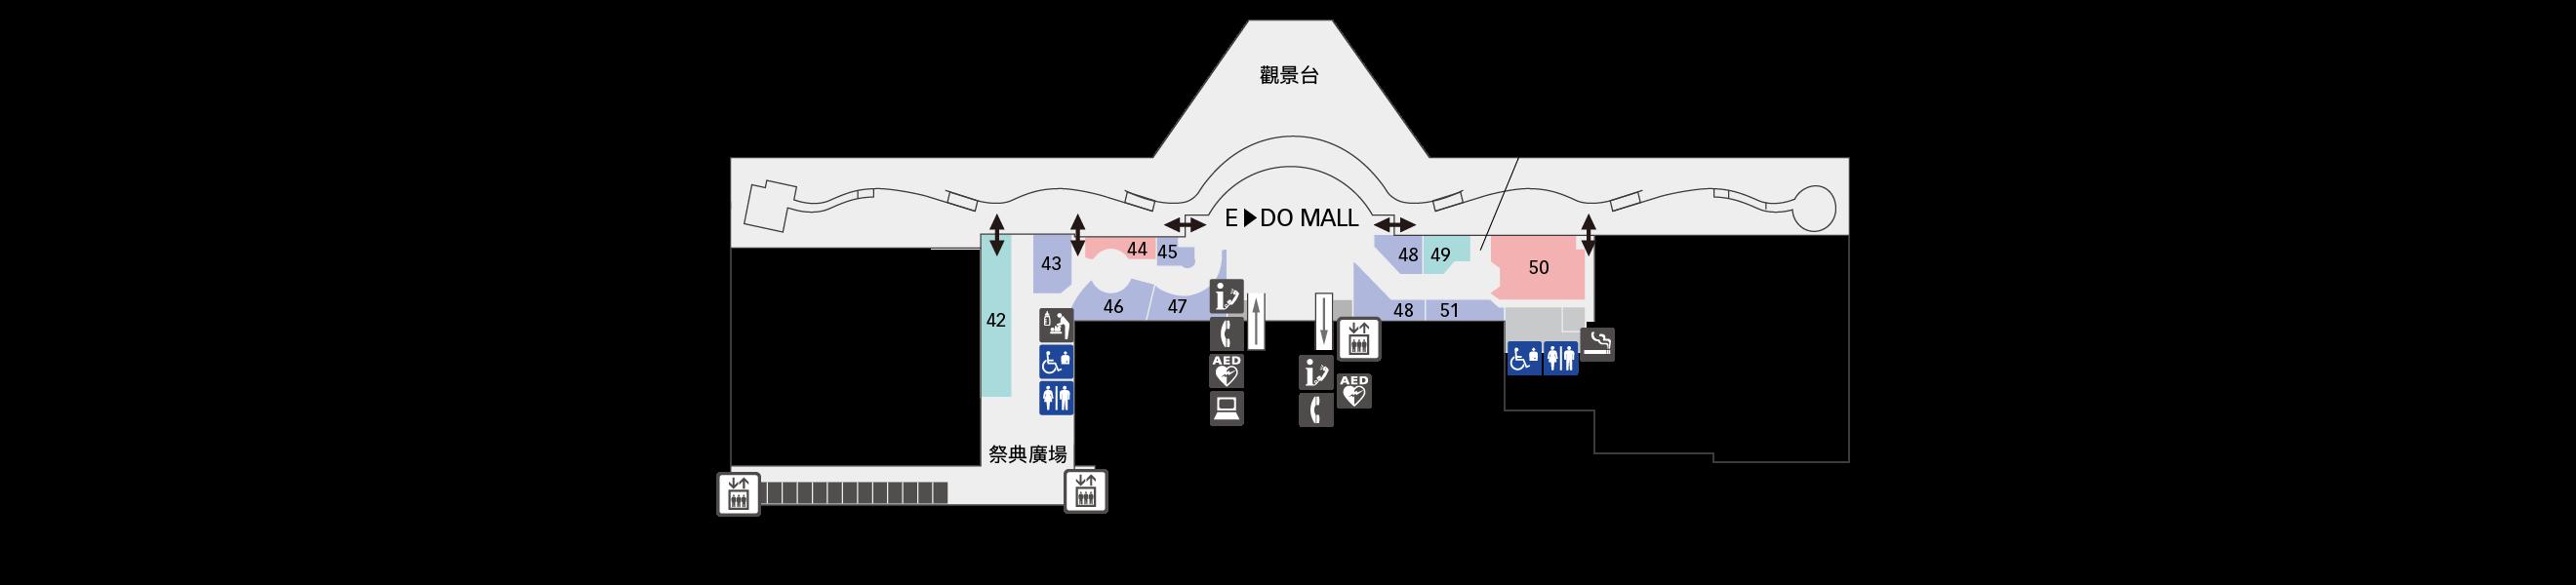 5F餐廳&商店樓層地圖